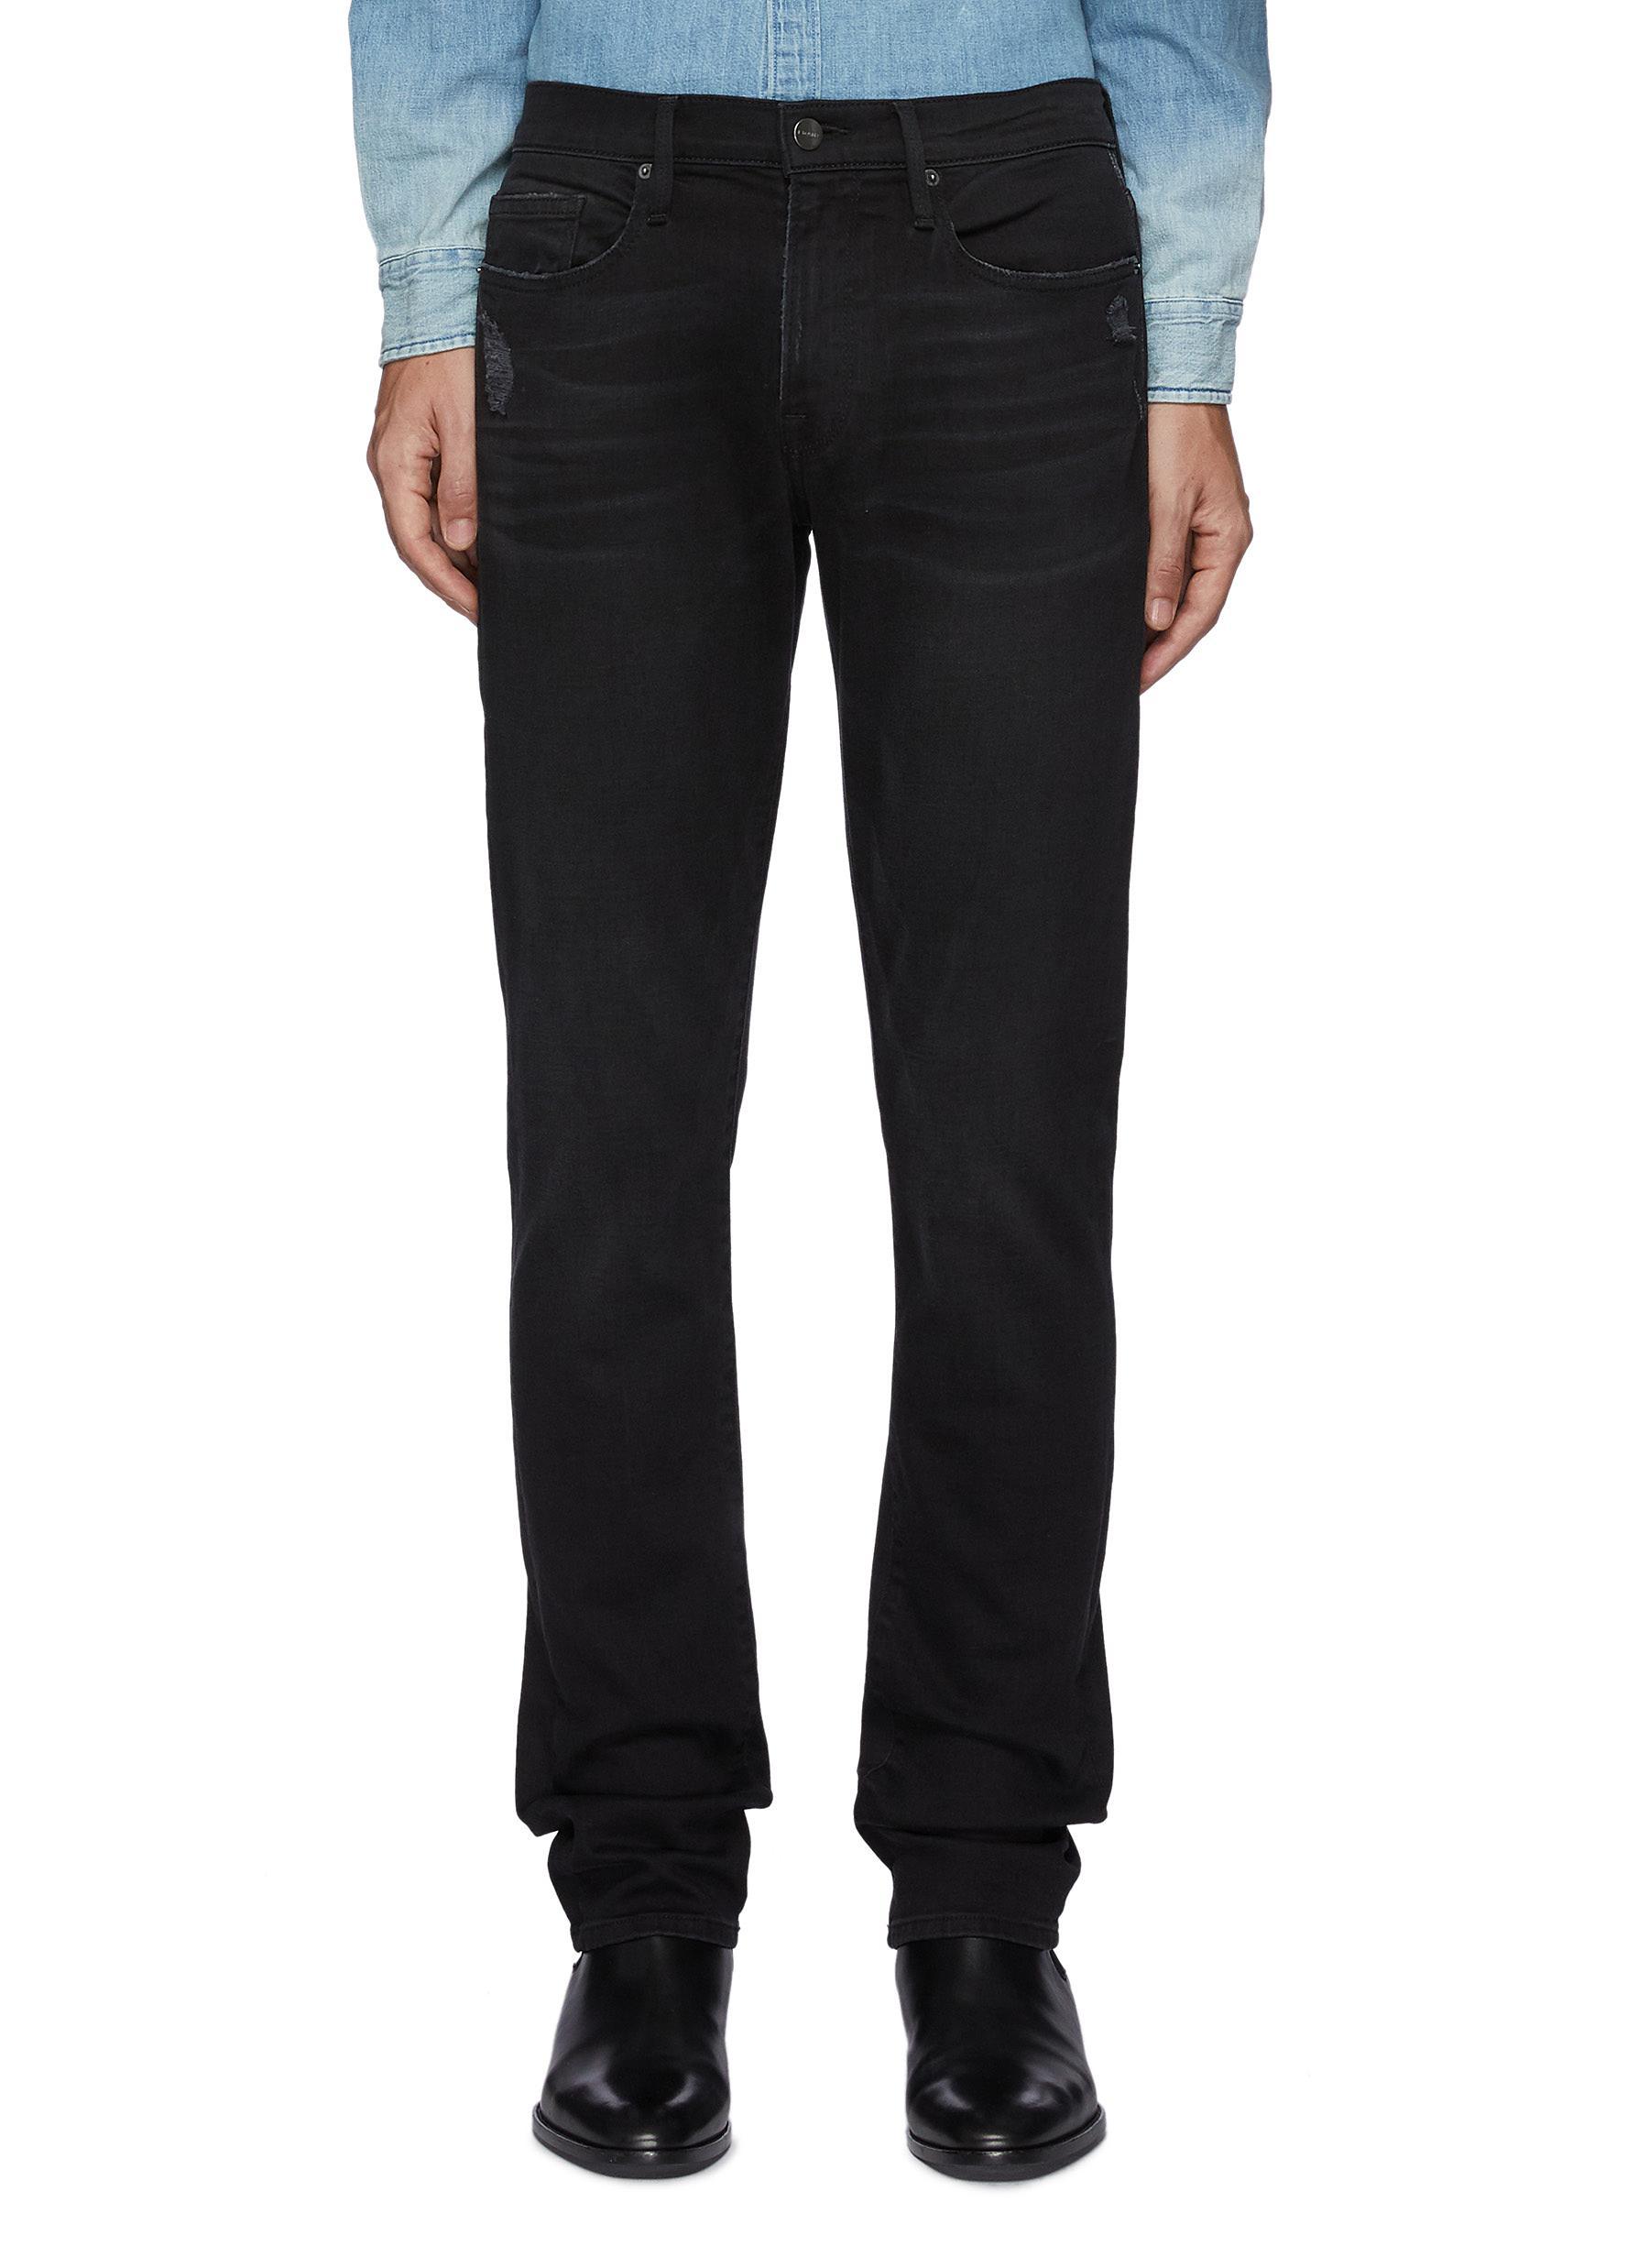 L'Homme Slim Fit Dark Washed Jeans